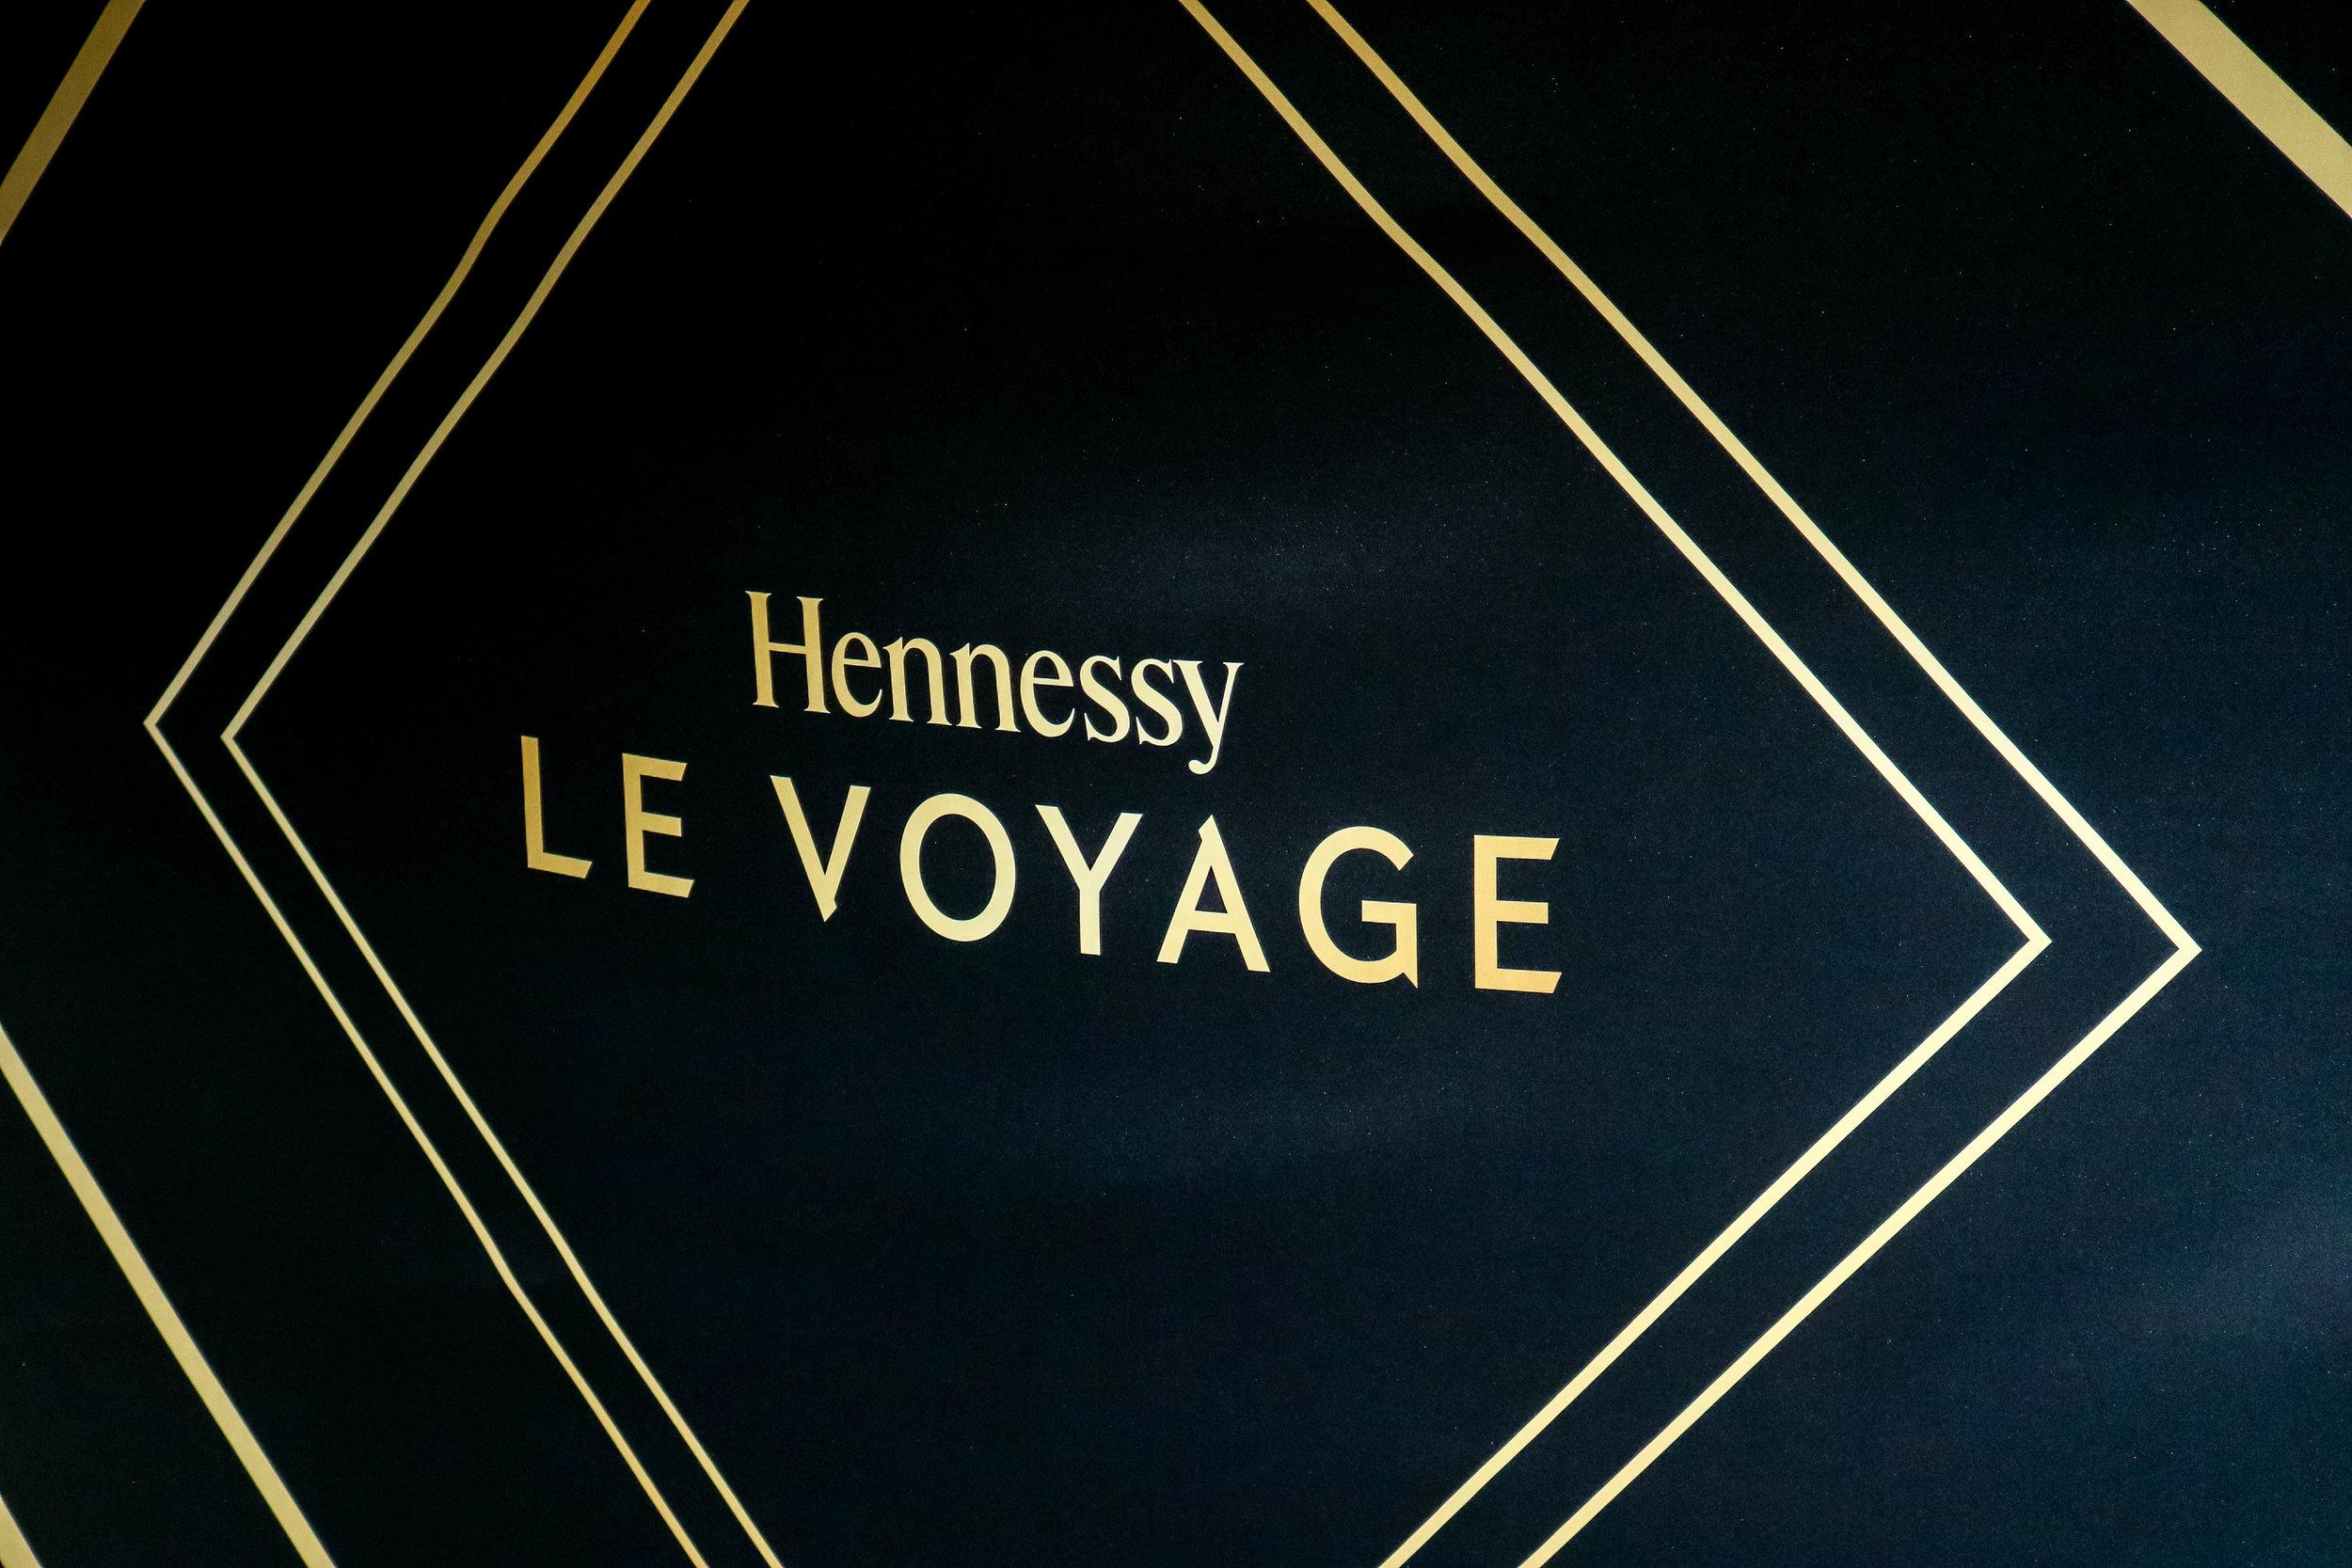 Hennessyle voyage -